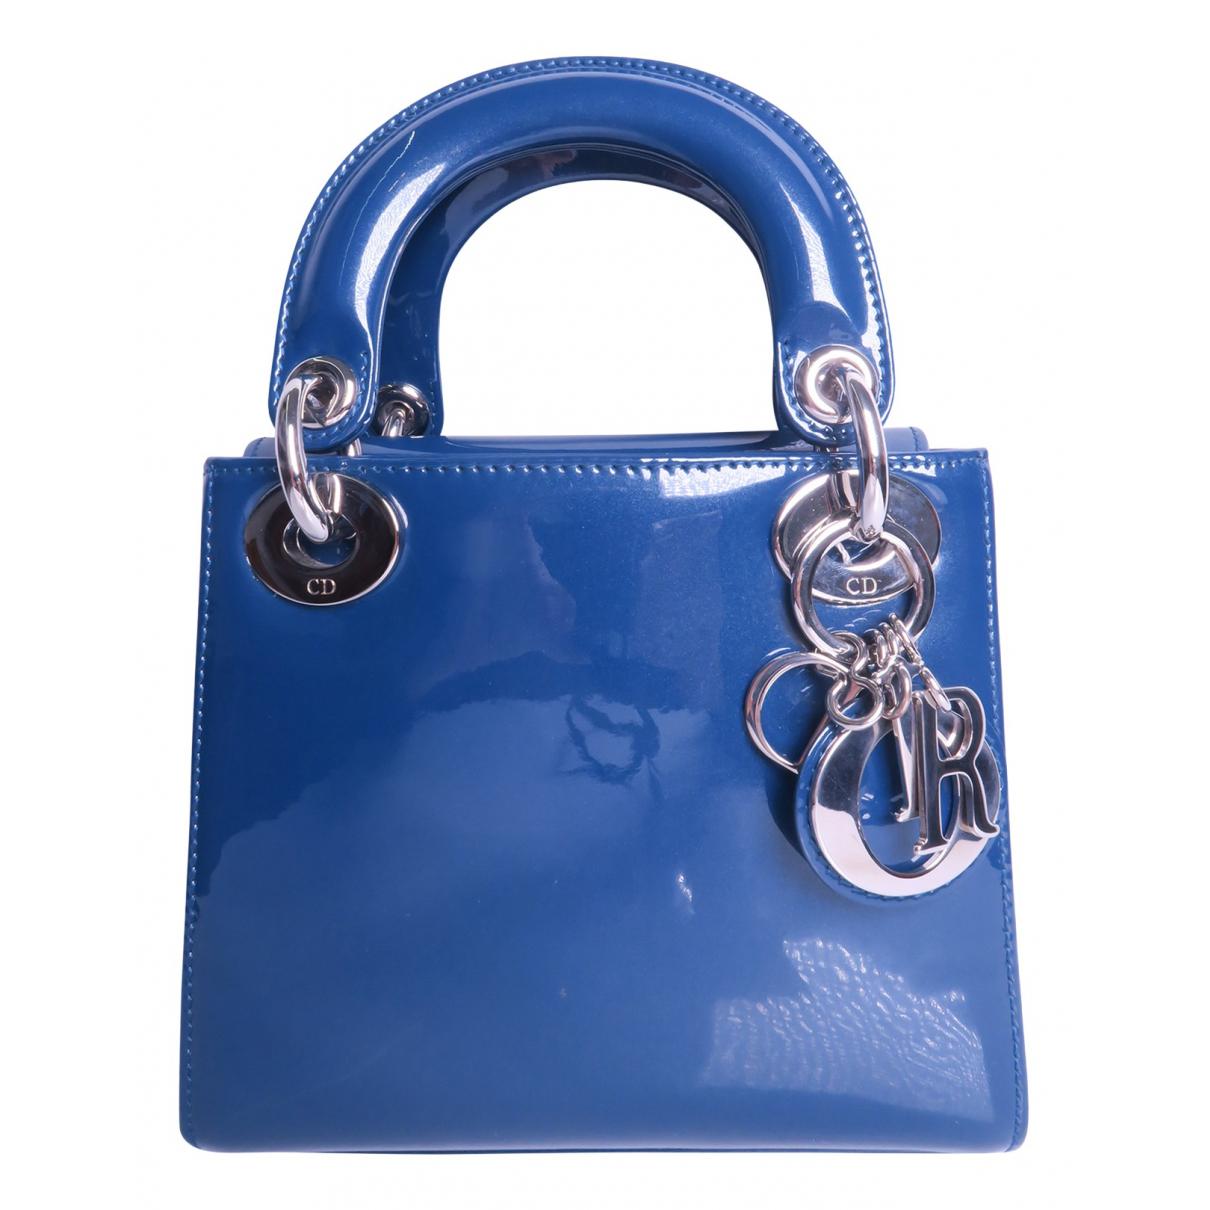 Dior Lady Dior Blue Patent leather handbag for Women N